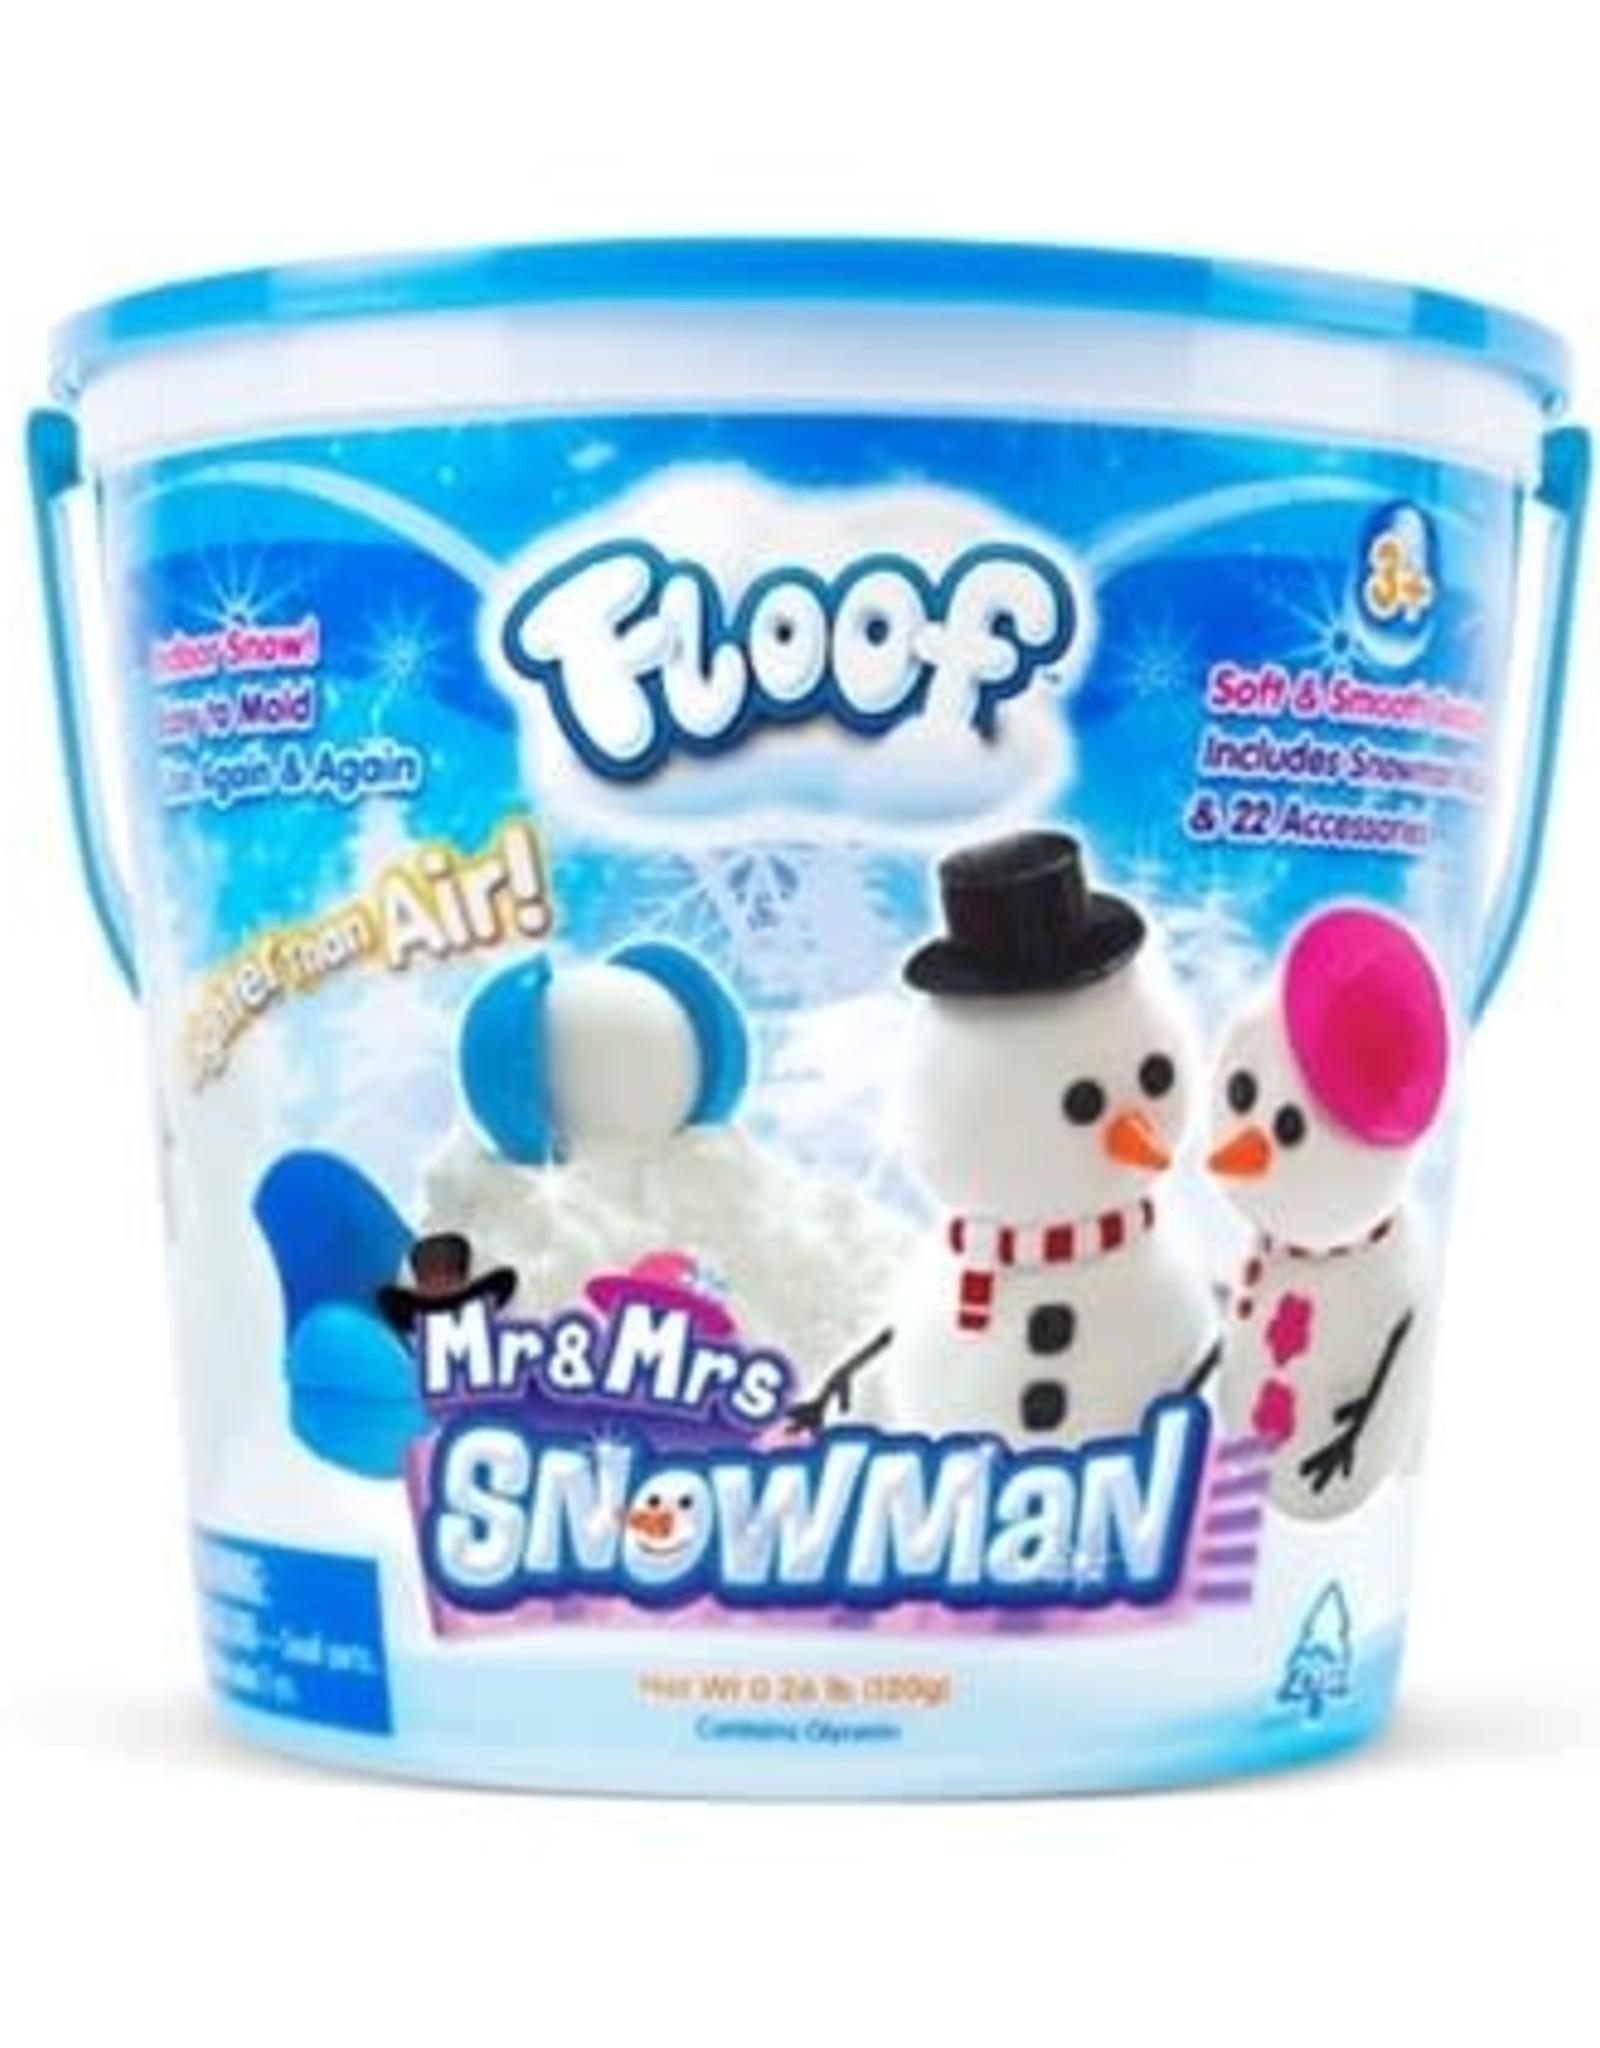 Play Visions Floof Mr. & Mrs. Snowman